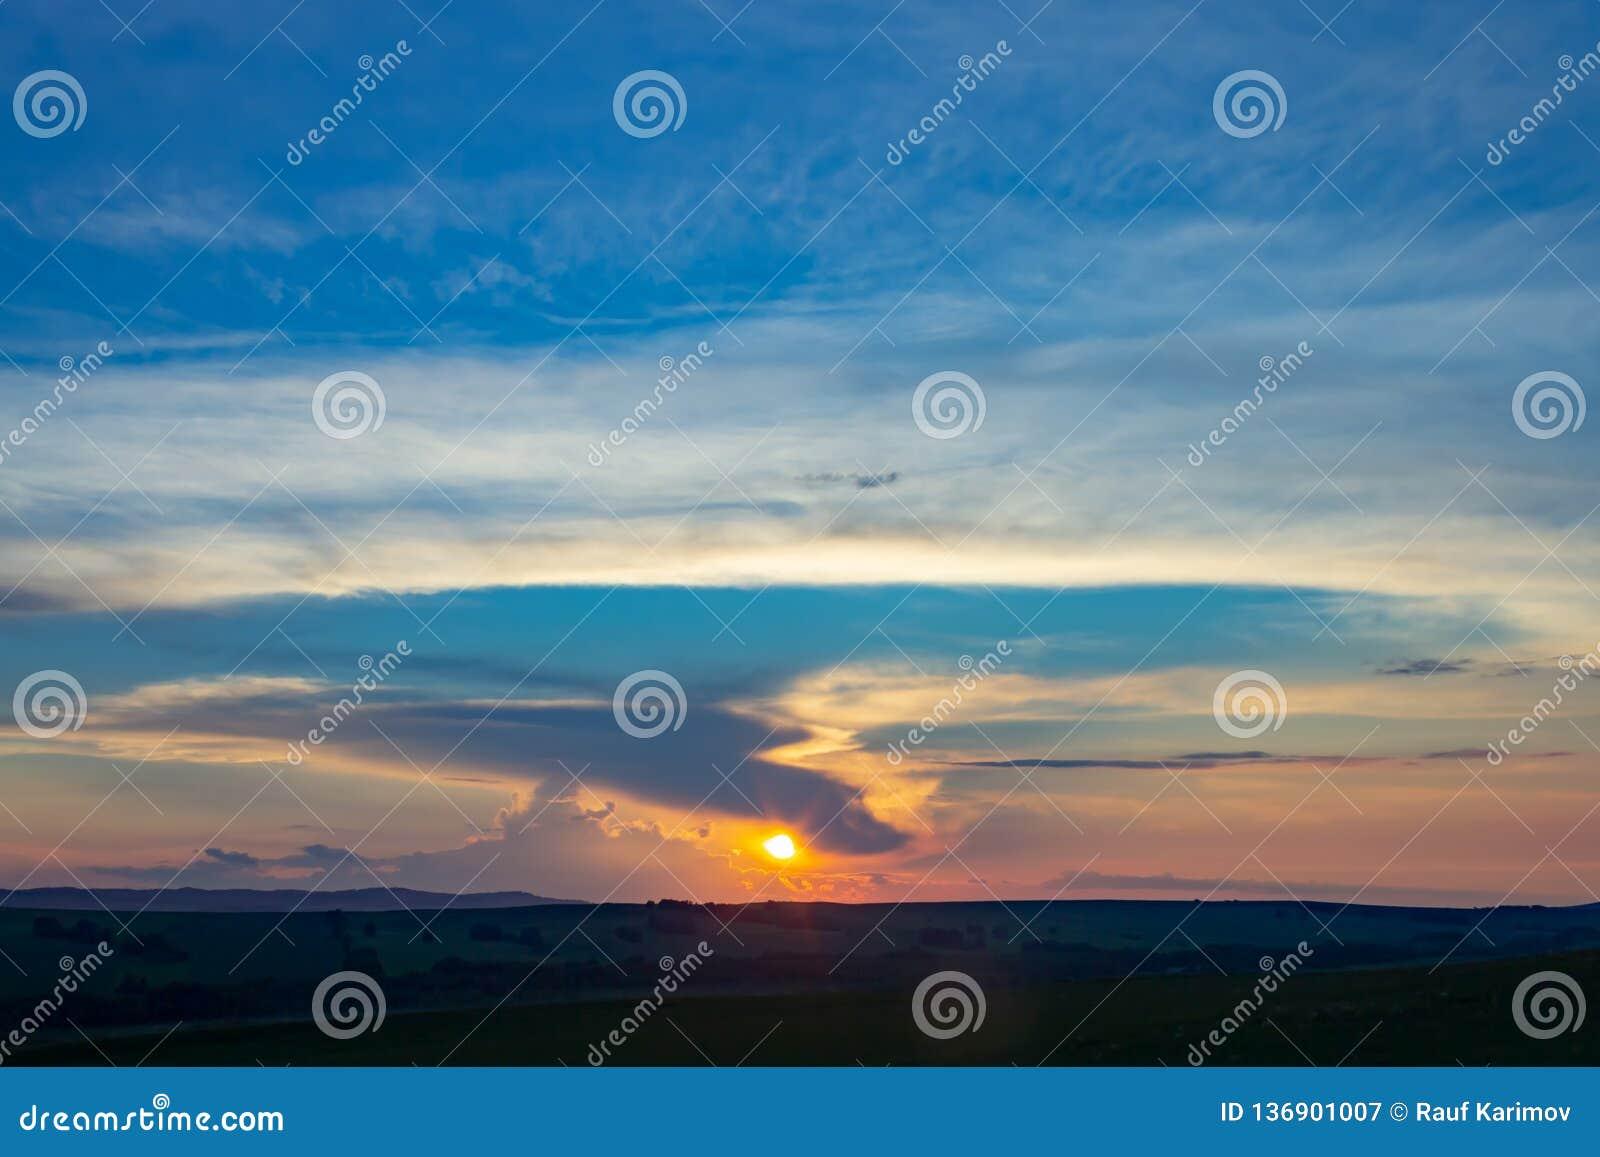 Sunset over the horizon against the blue sky